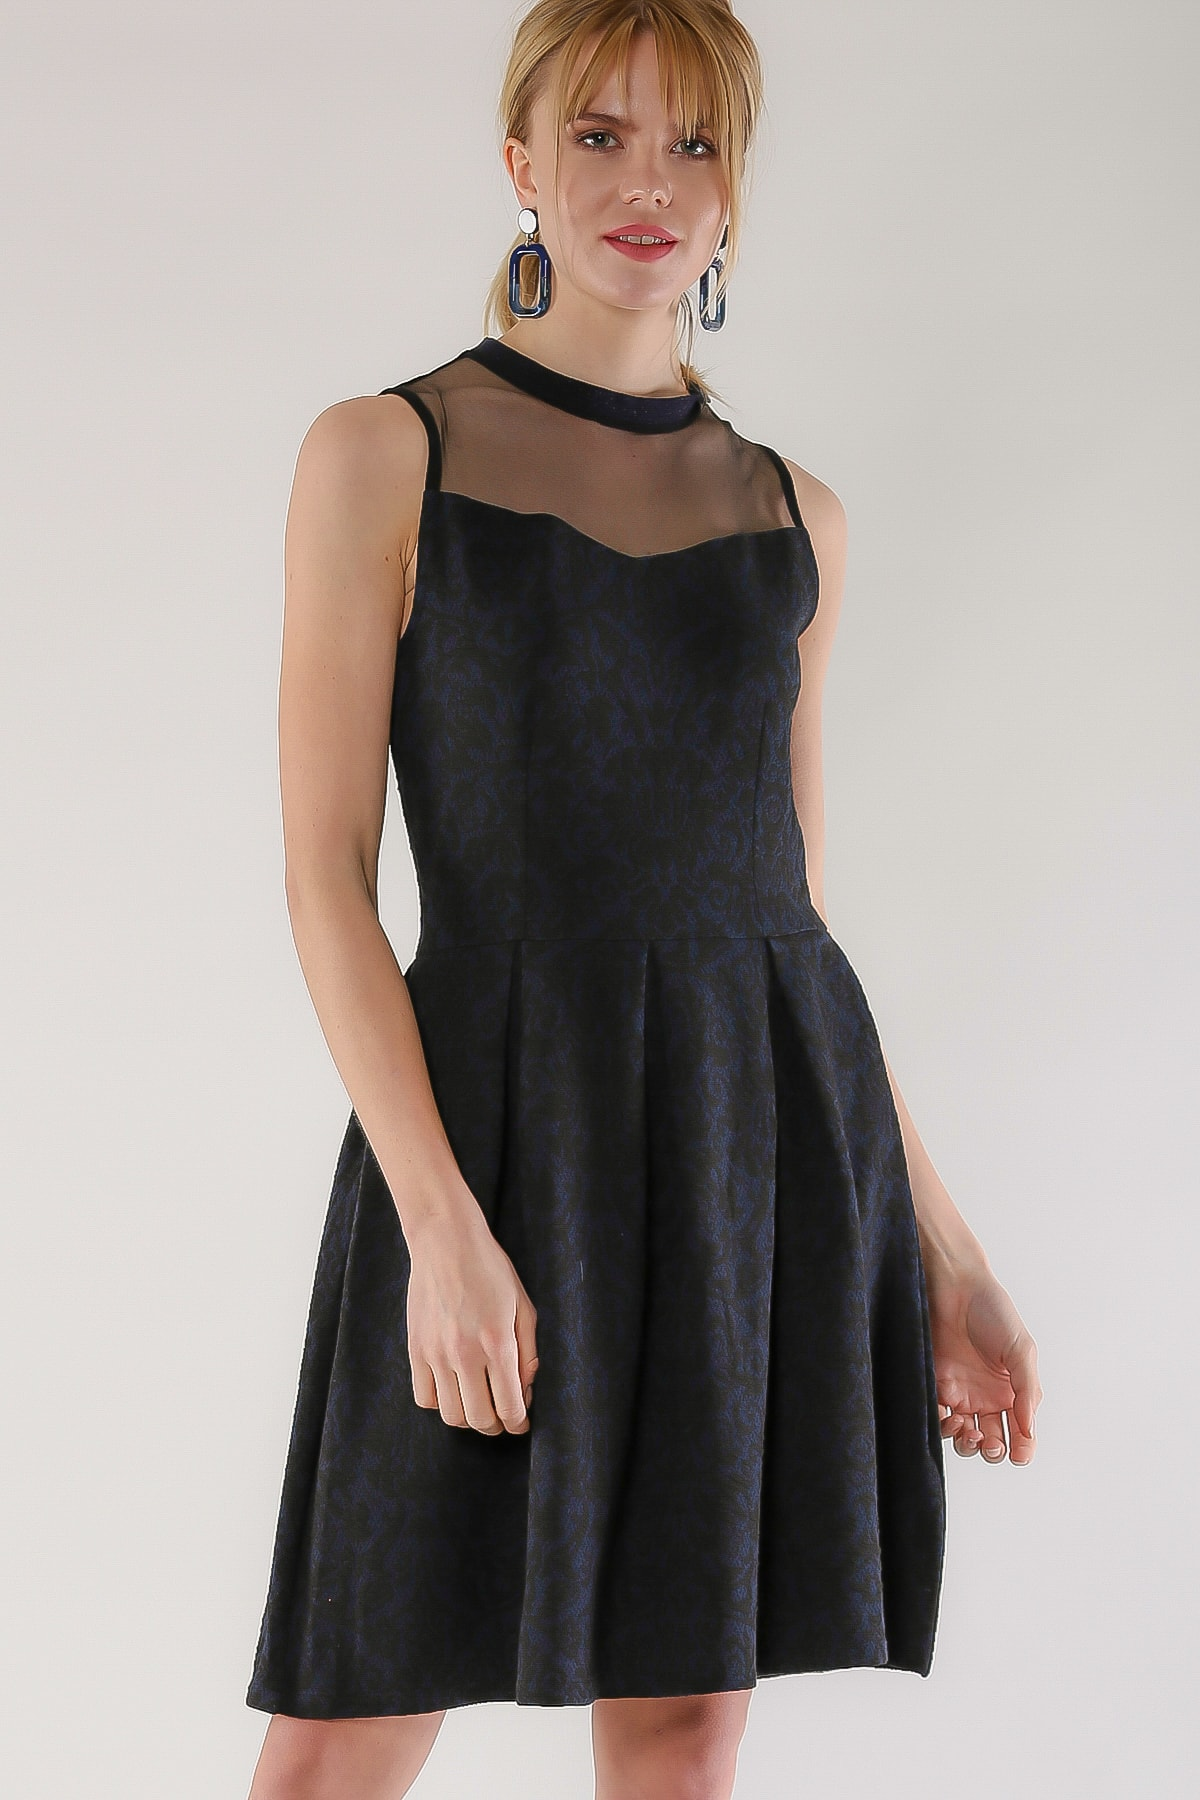 Chiccy Kadın Siyah Vintage Robası Mesh Detaylı Elbise M10160000EL97476